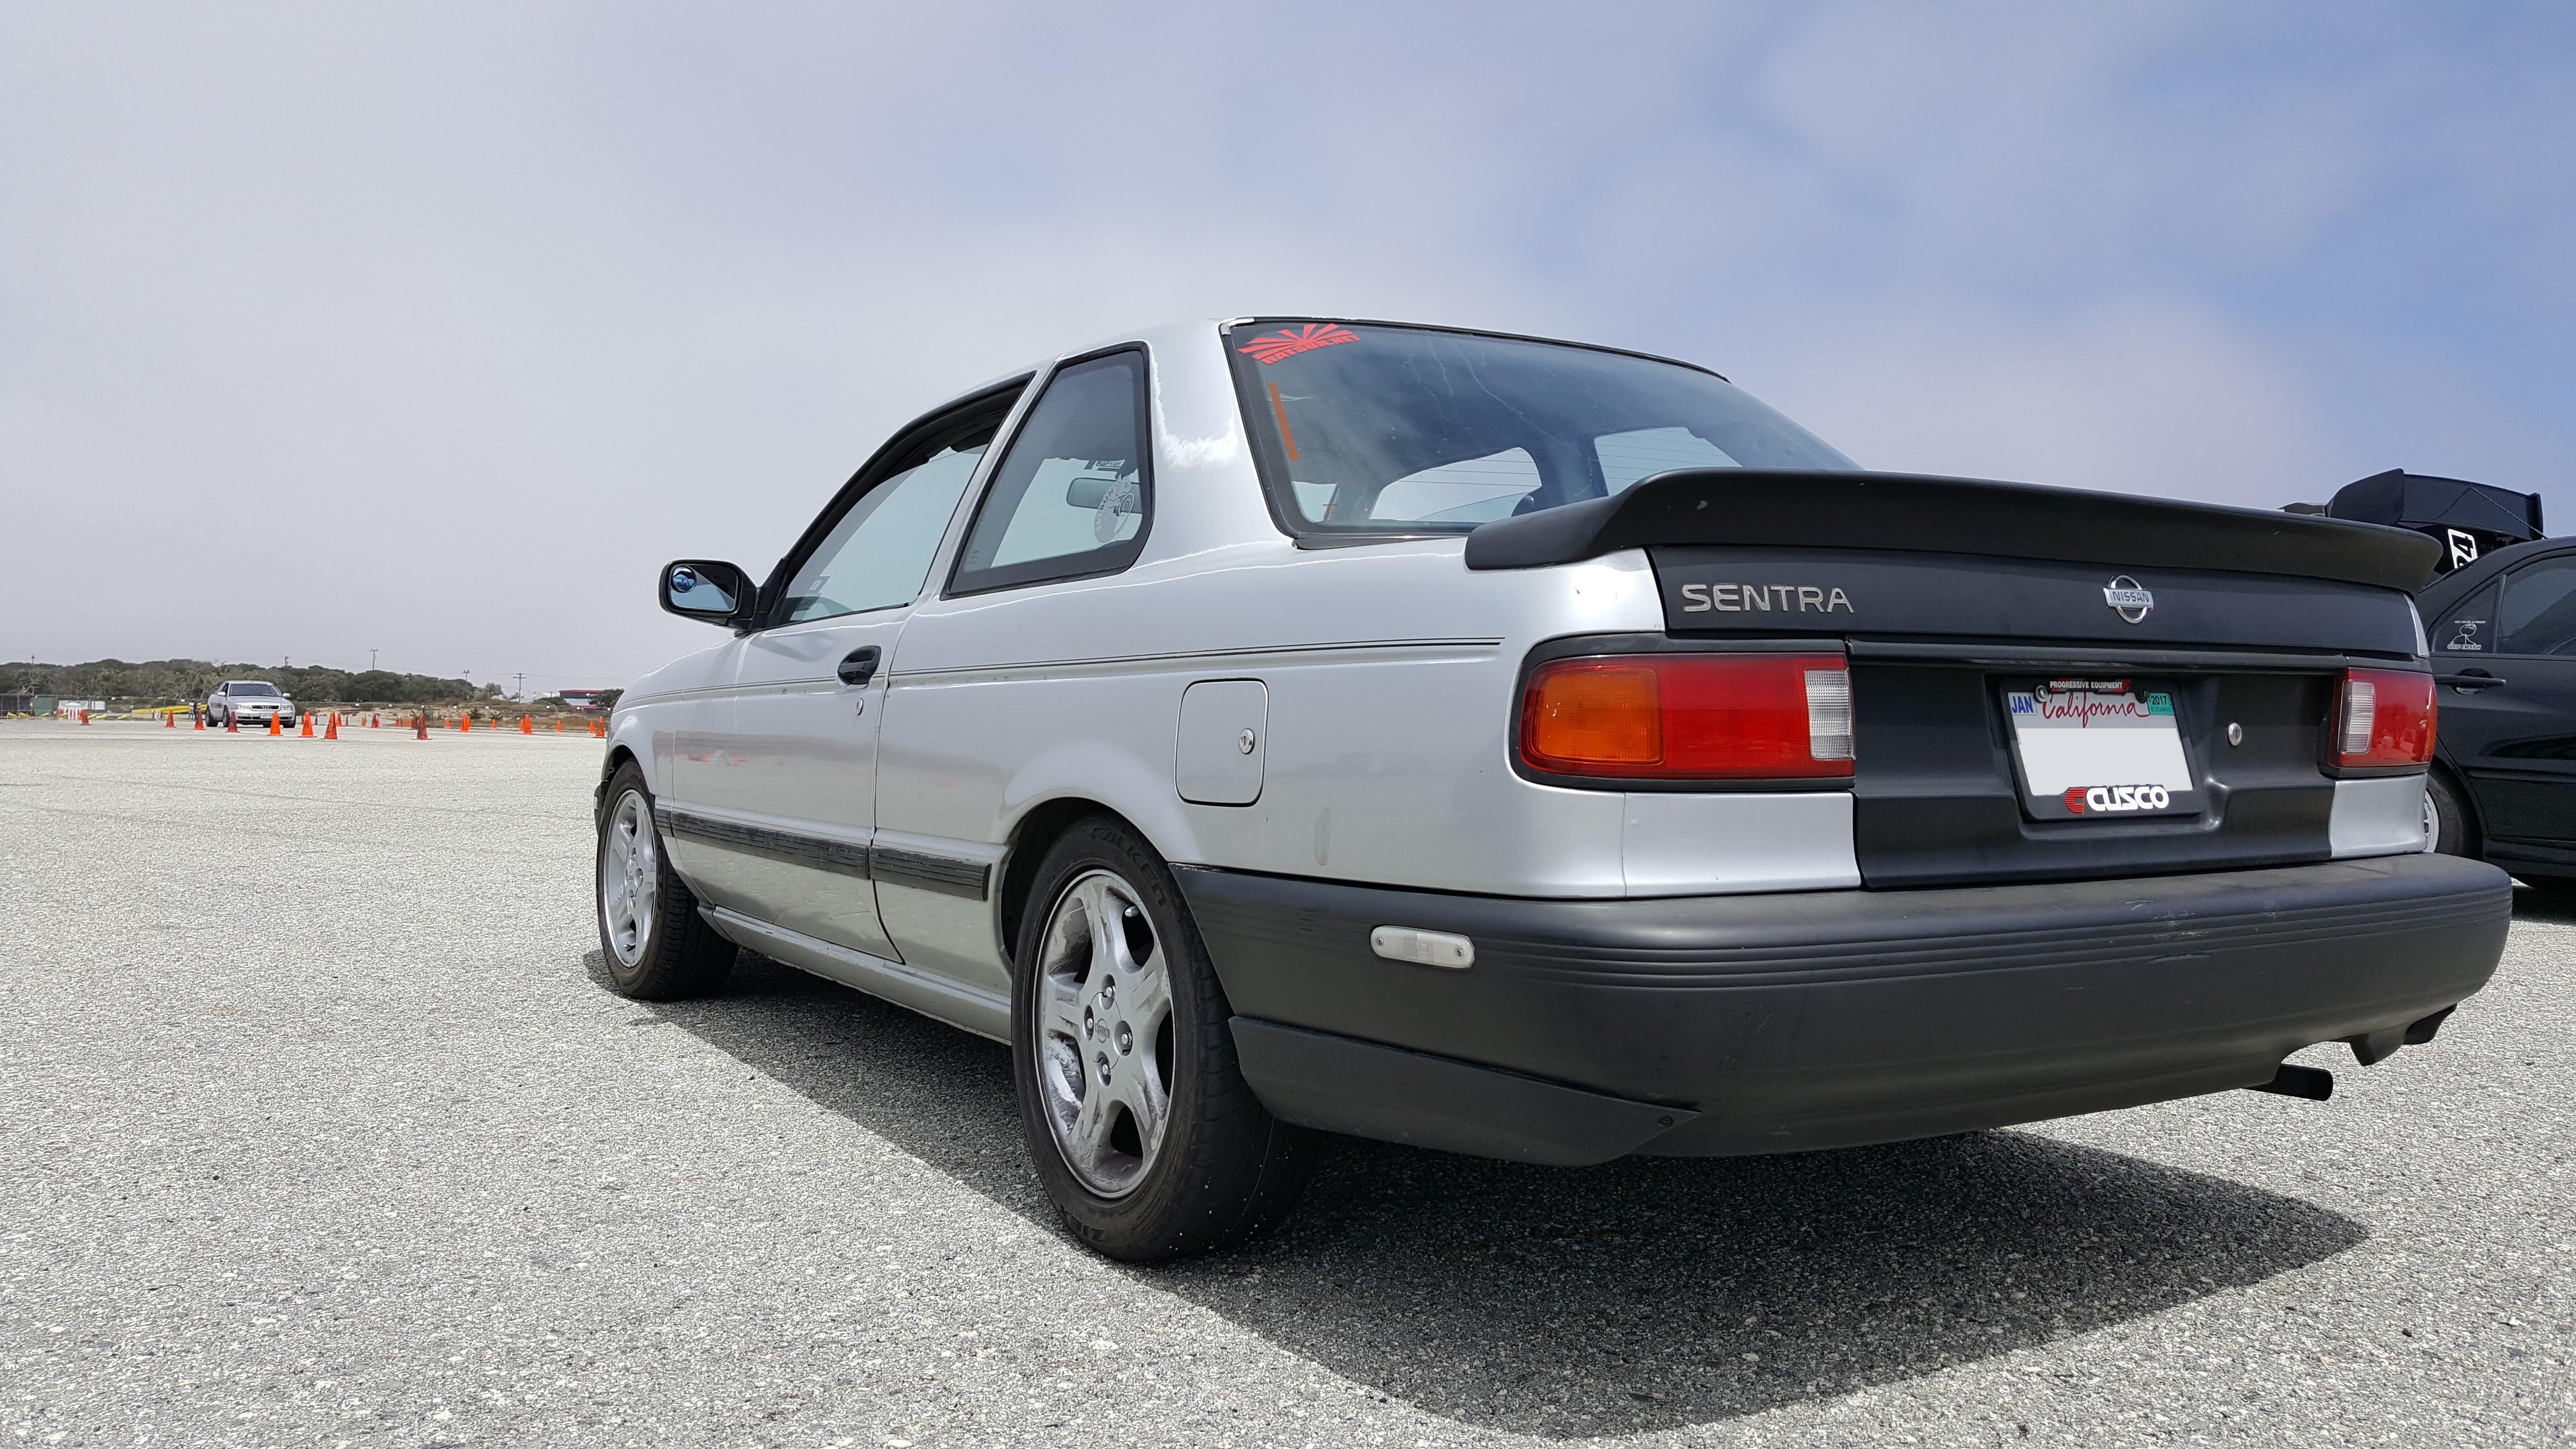 Z-Car Blog » Post Topic » The Underdog: Paul's Nissan Sentra